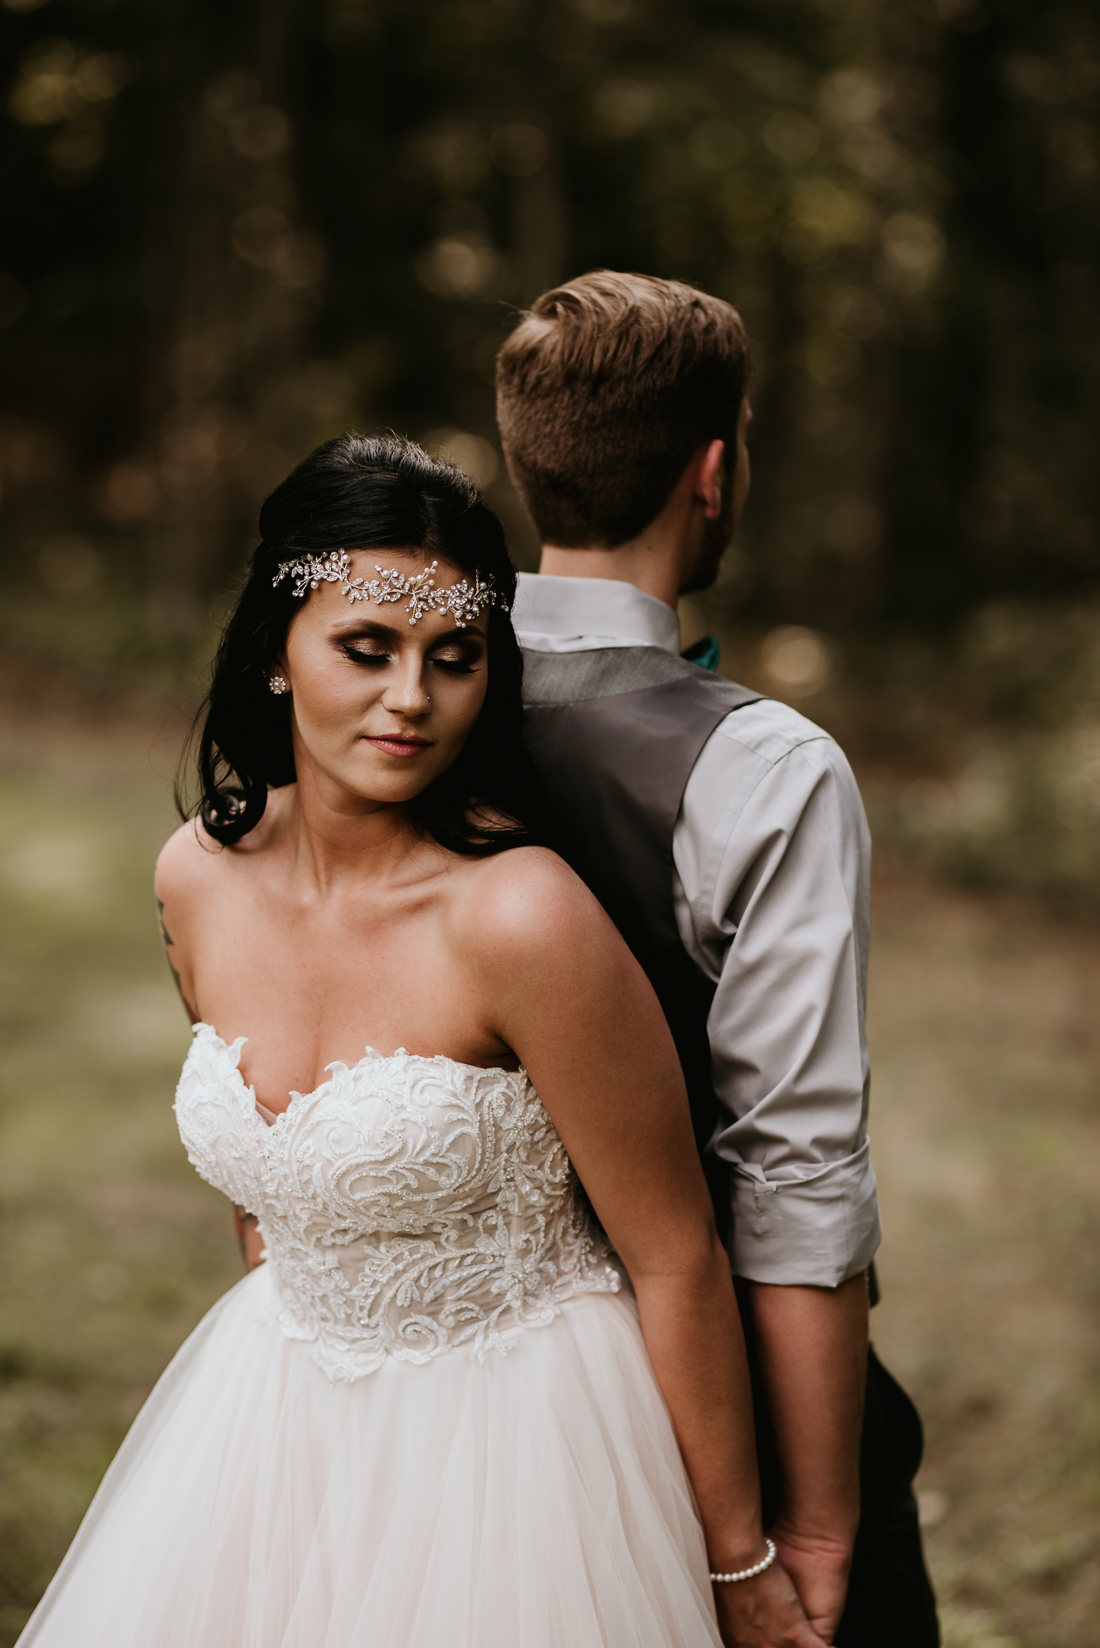 olivia_zay_wedding_09_2018-7509.jpg